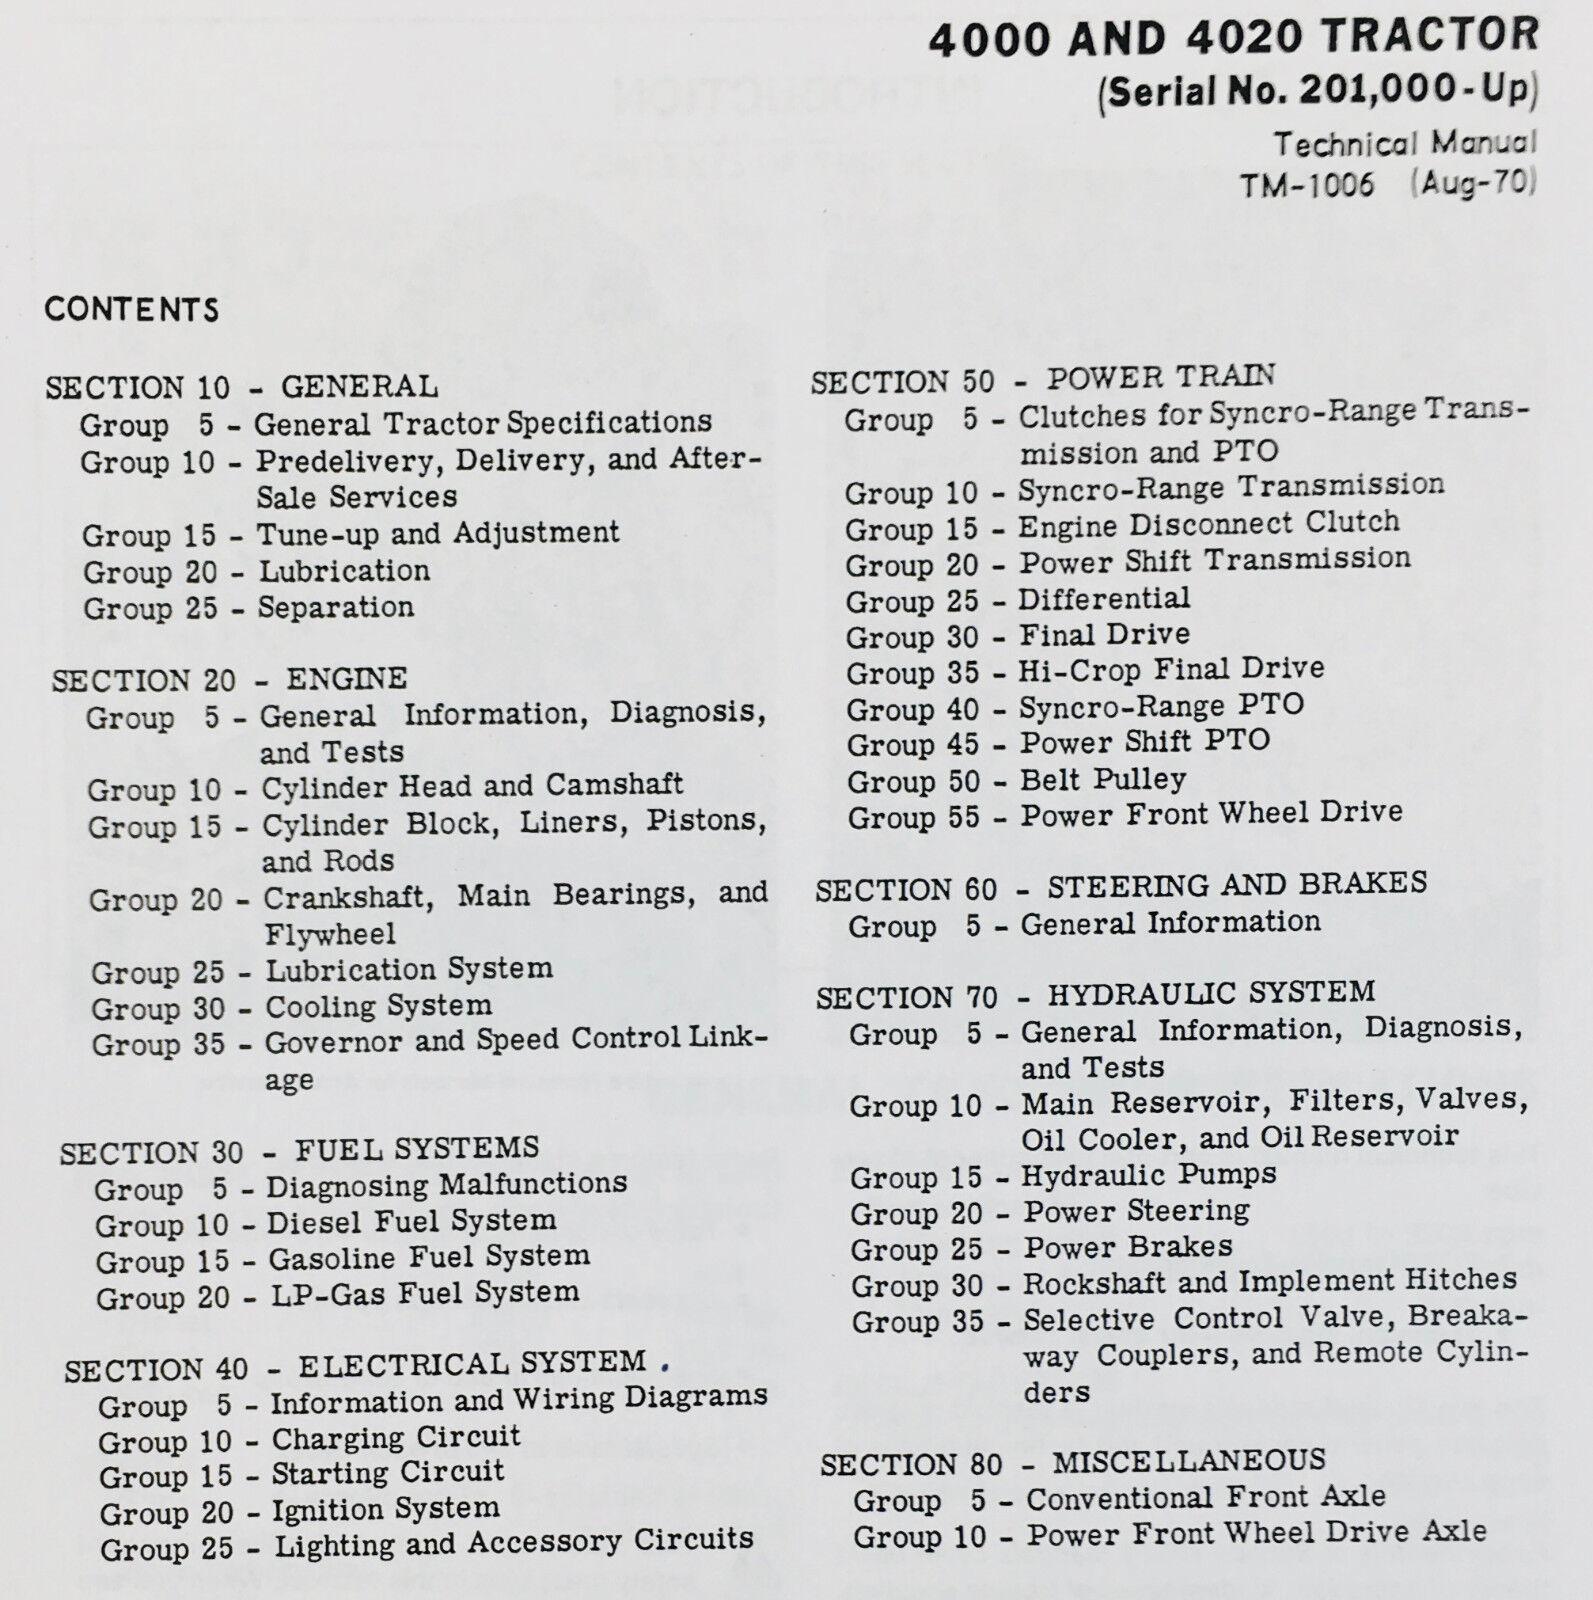 Wiring Diagram John Deere 4020 Powershift List Of Schematic 50 Service Manual For 4000 Tractor Technical Repair Rh Ebay Com